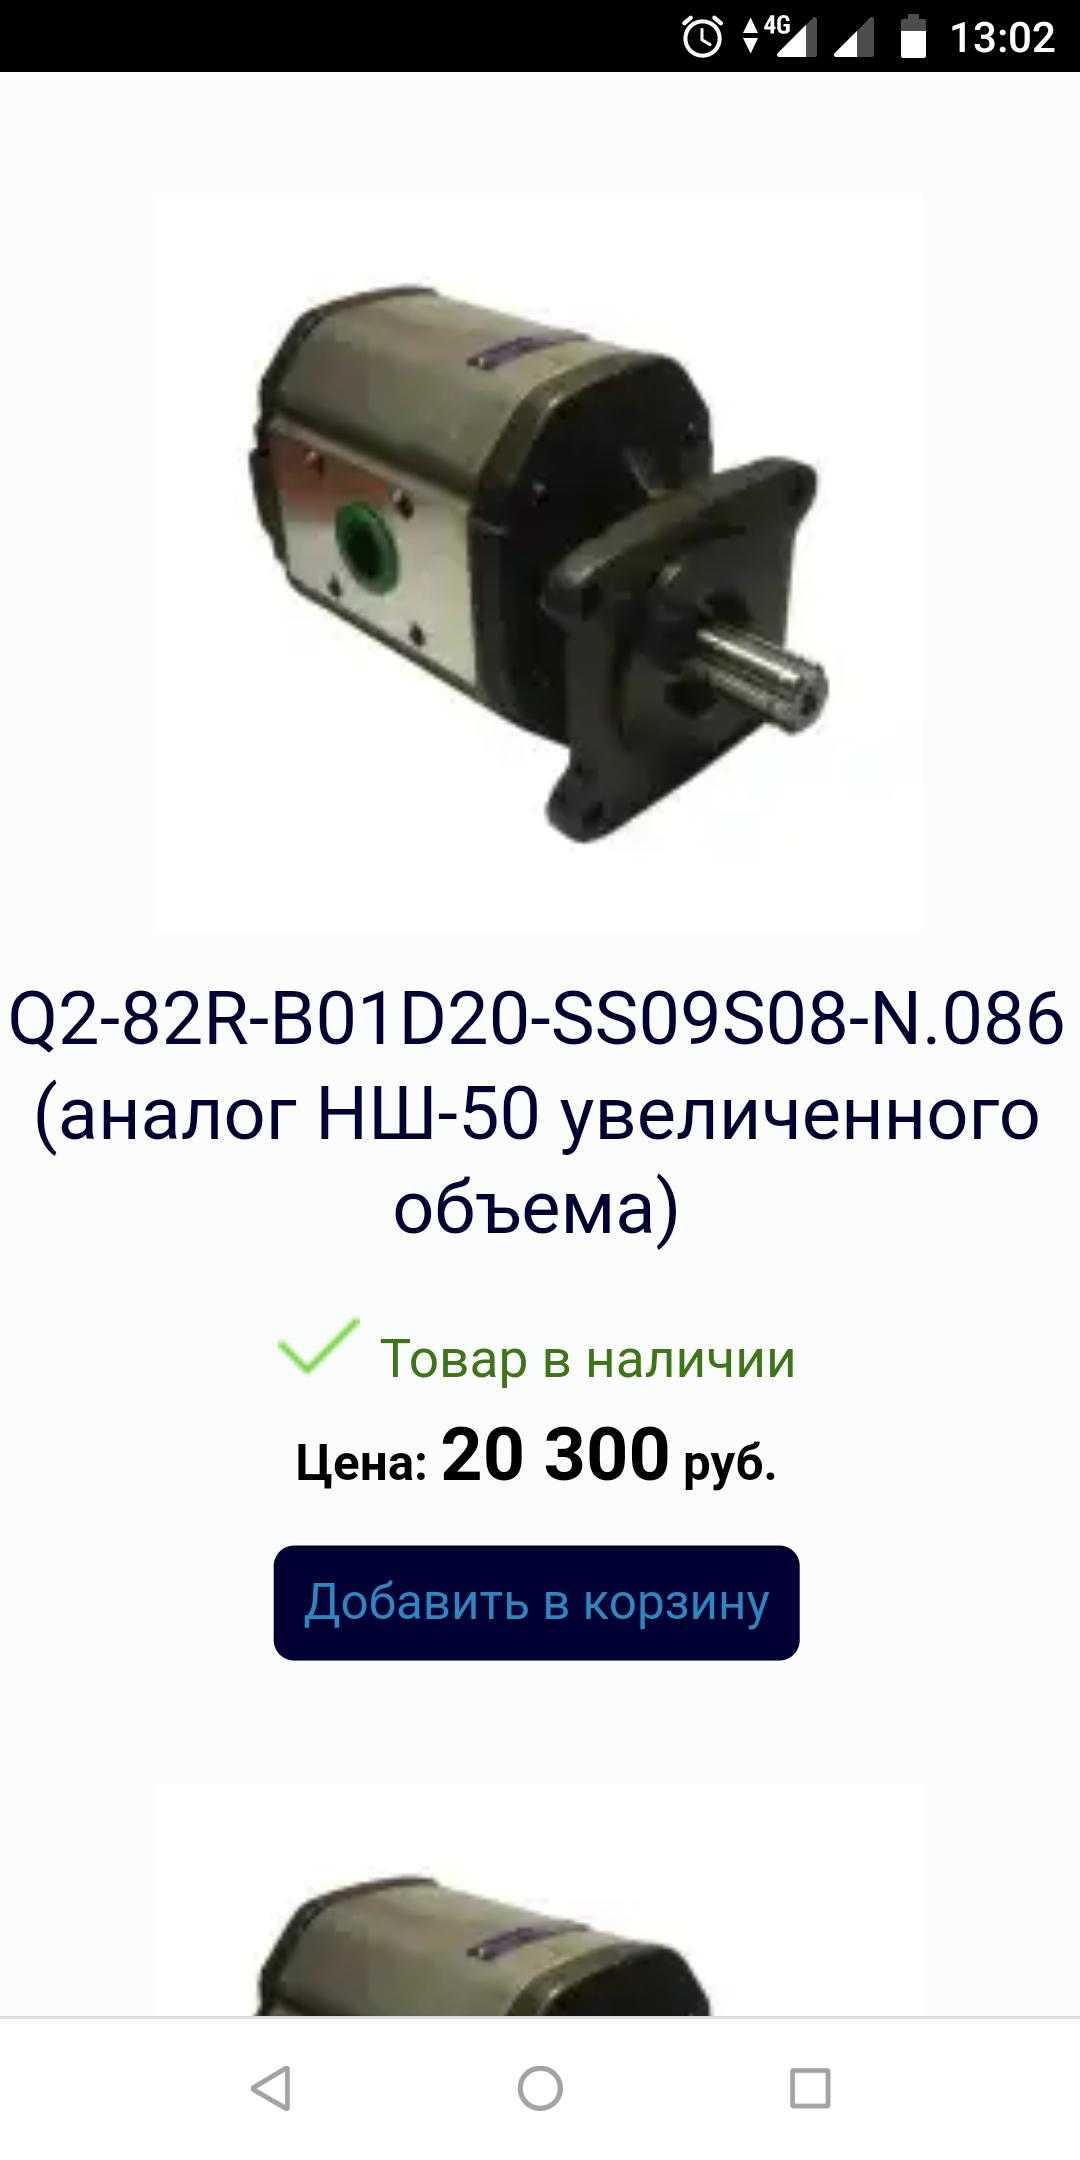 screenshot20190816-130231.png